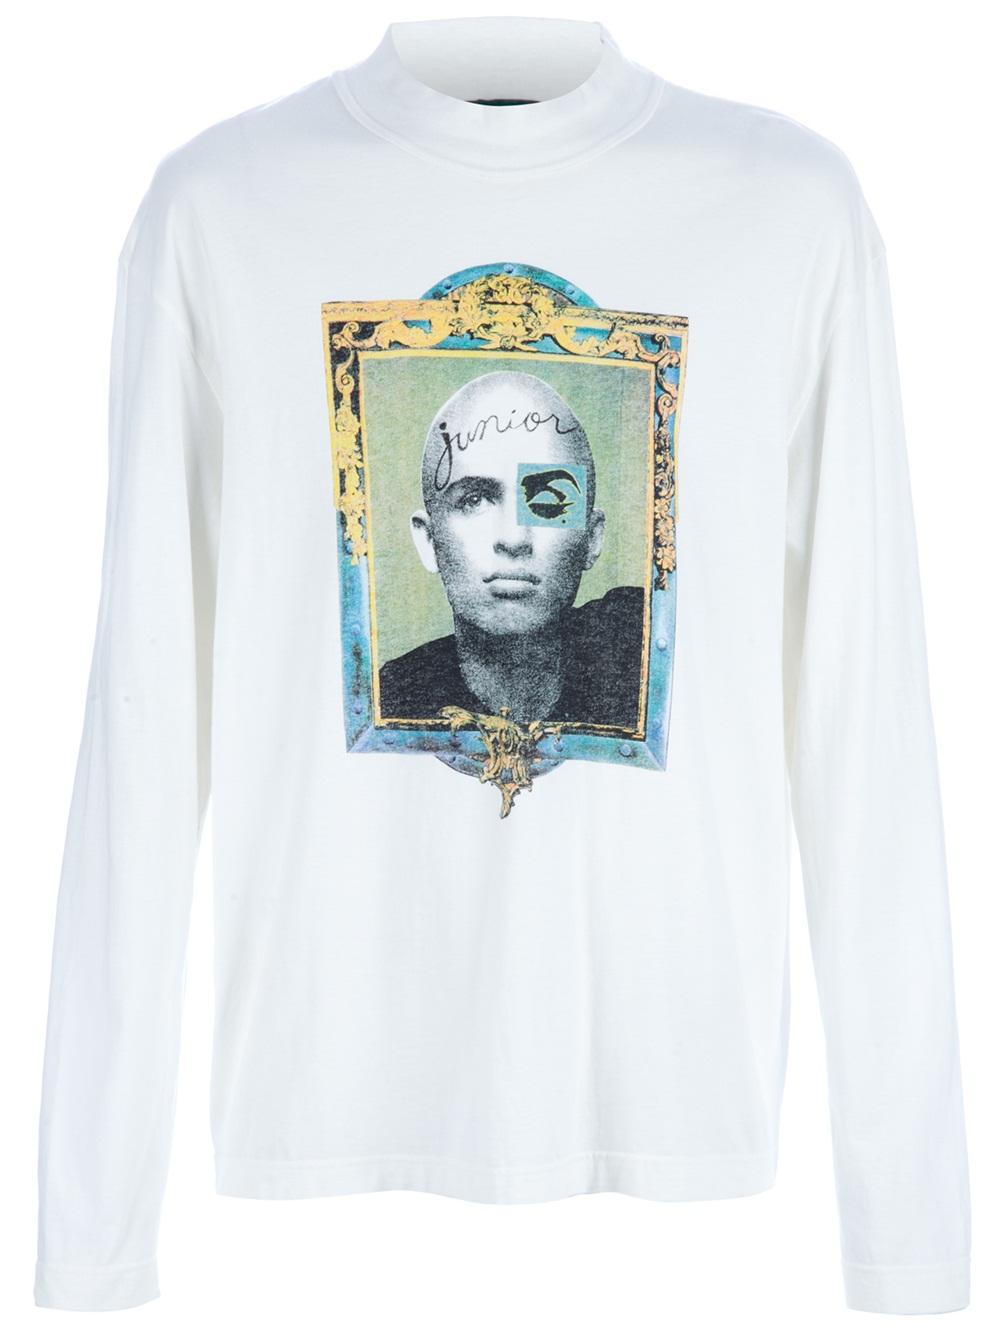 Junior Gaultier printed sweater